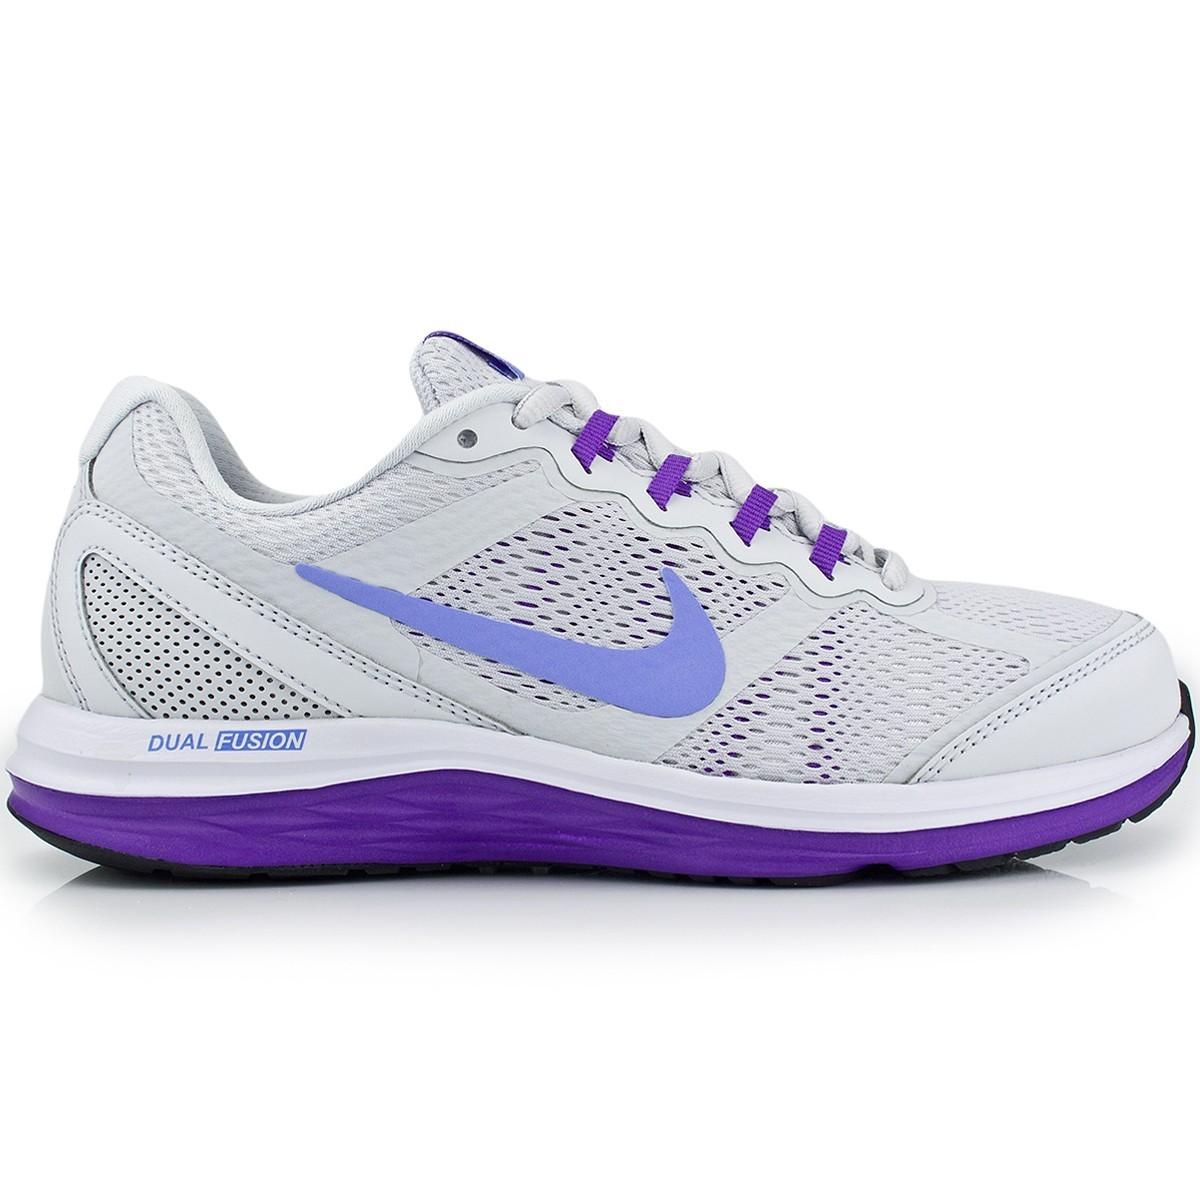 9ab4e8157 Bizz Store - Tênis Feminino Nike Dual Fusion Run 3 Para Corrida